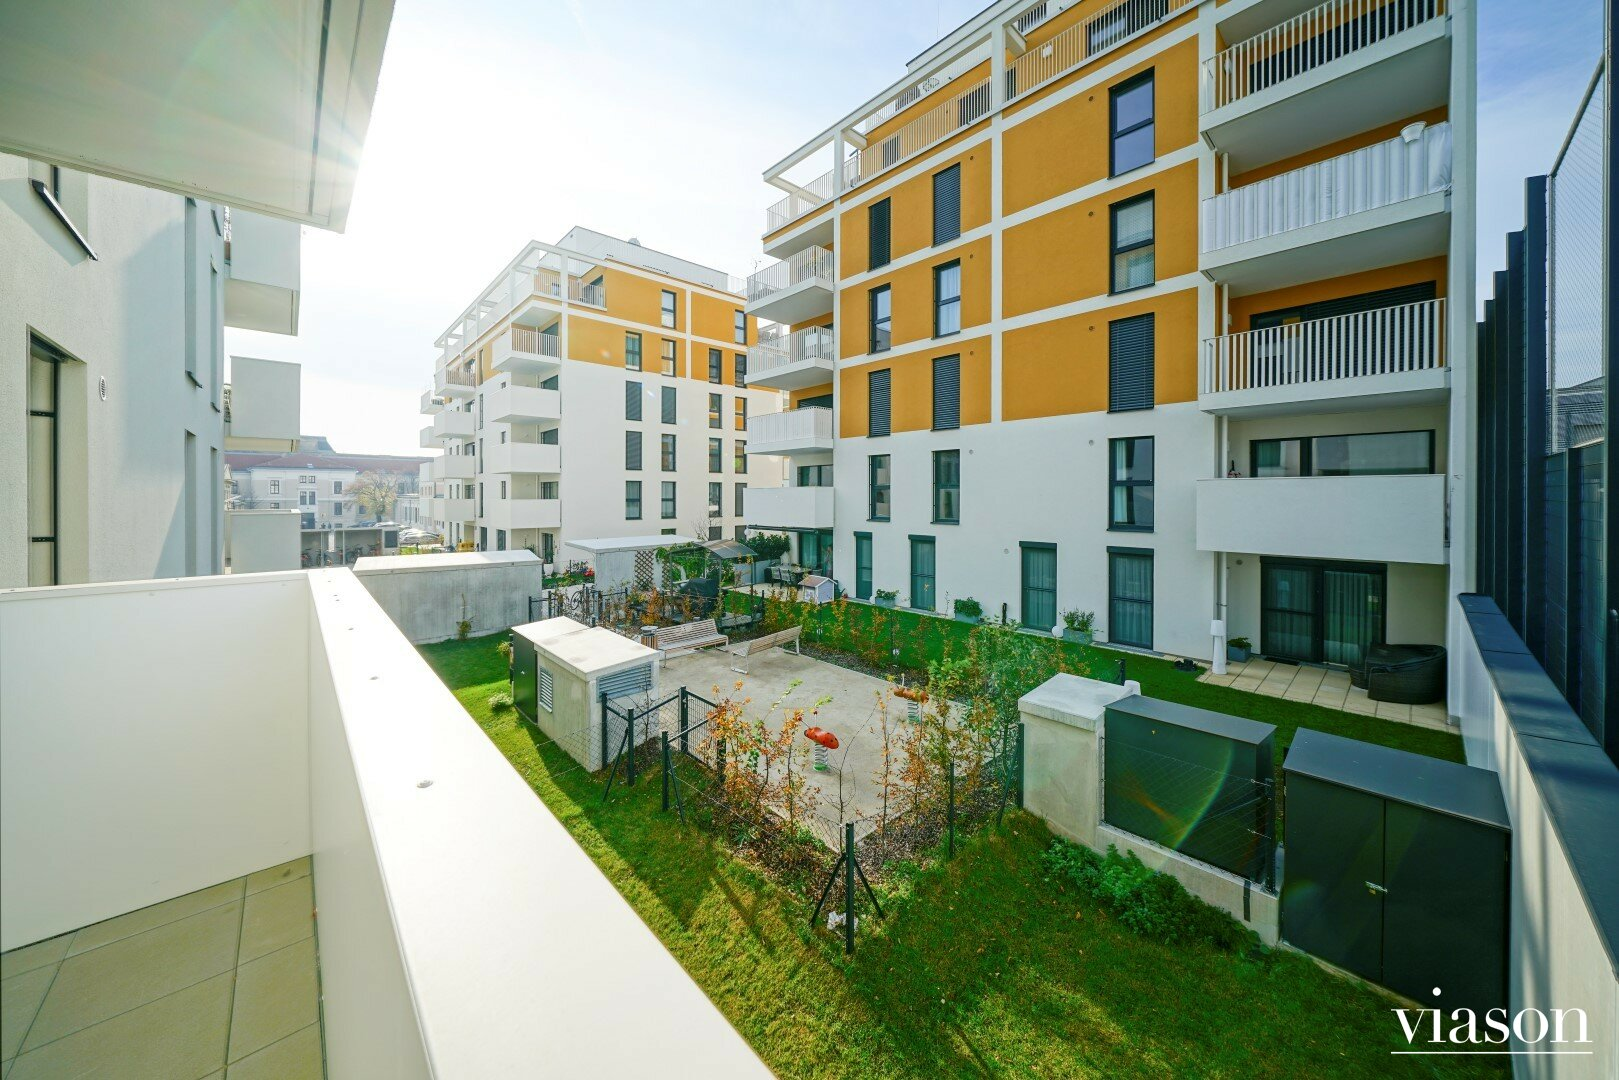 Loggia/Balkon Blick